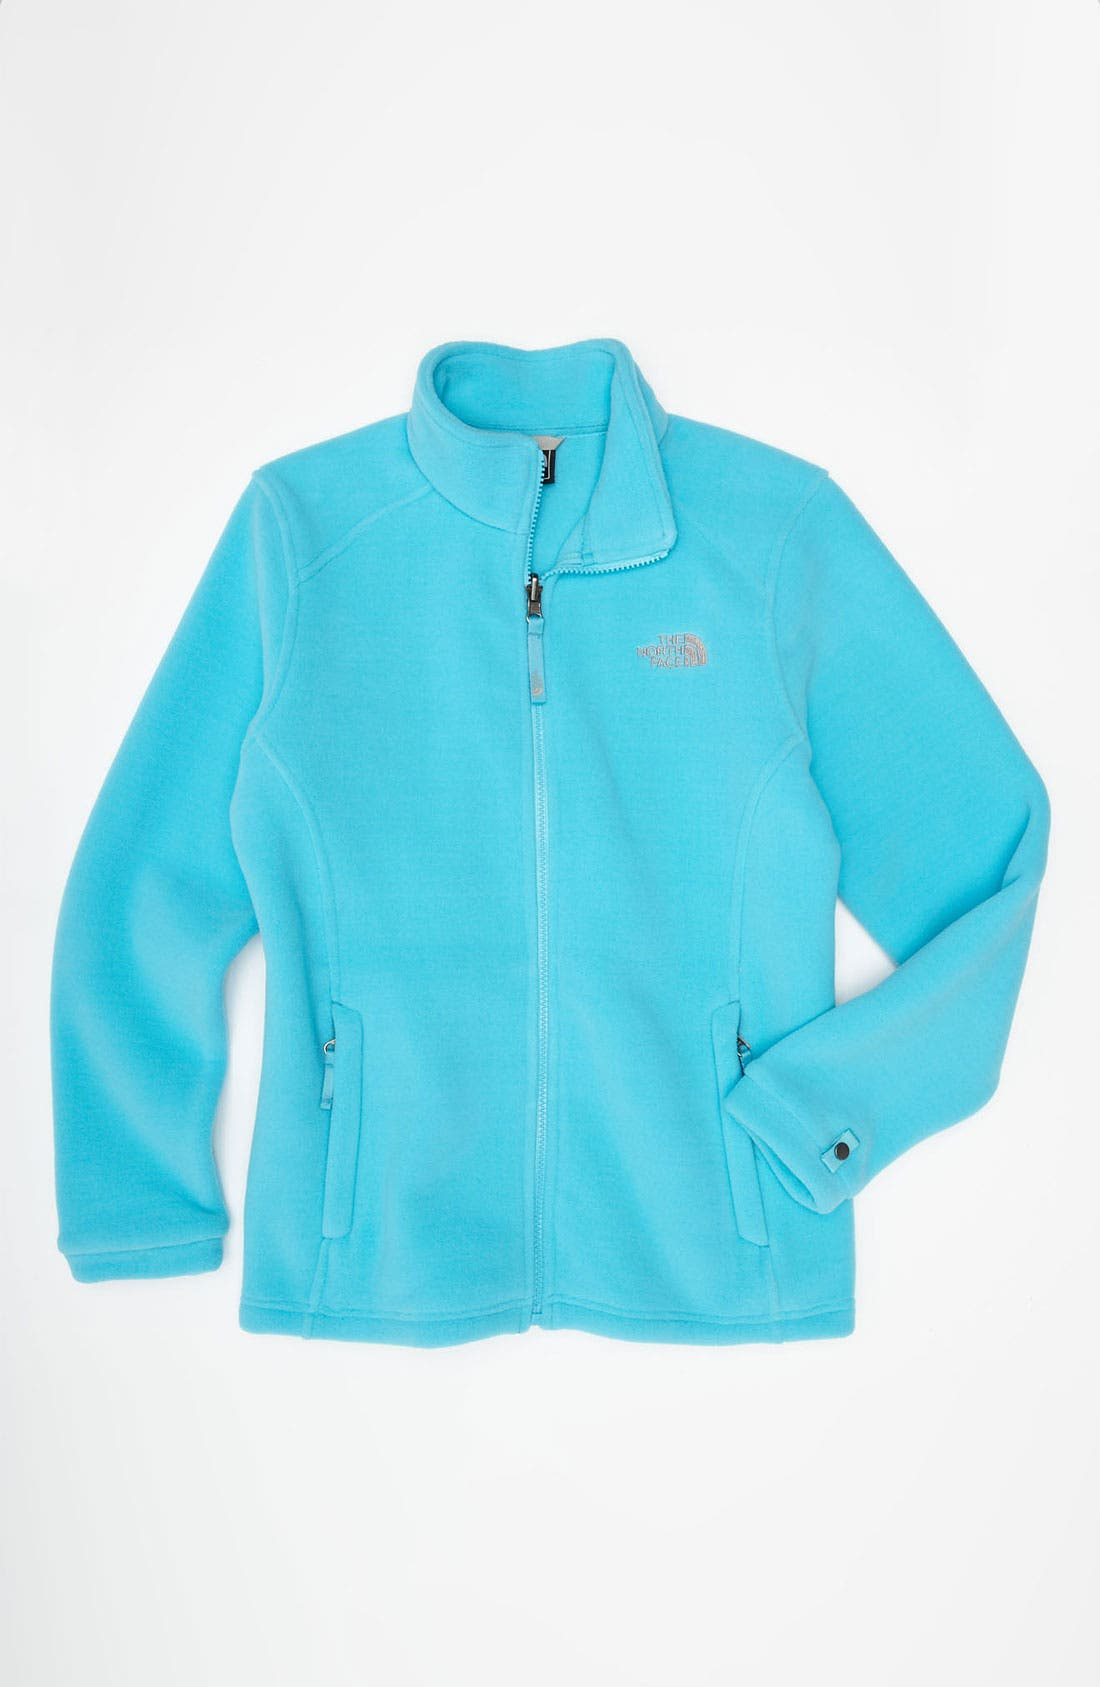 Main Image - The North Face 'Lil' RDT' Fleece Jacket (Little Girls & Big Girls)